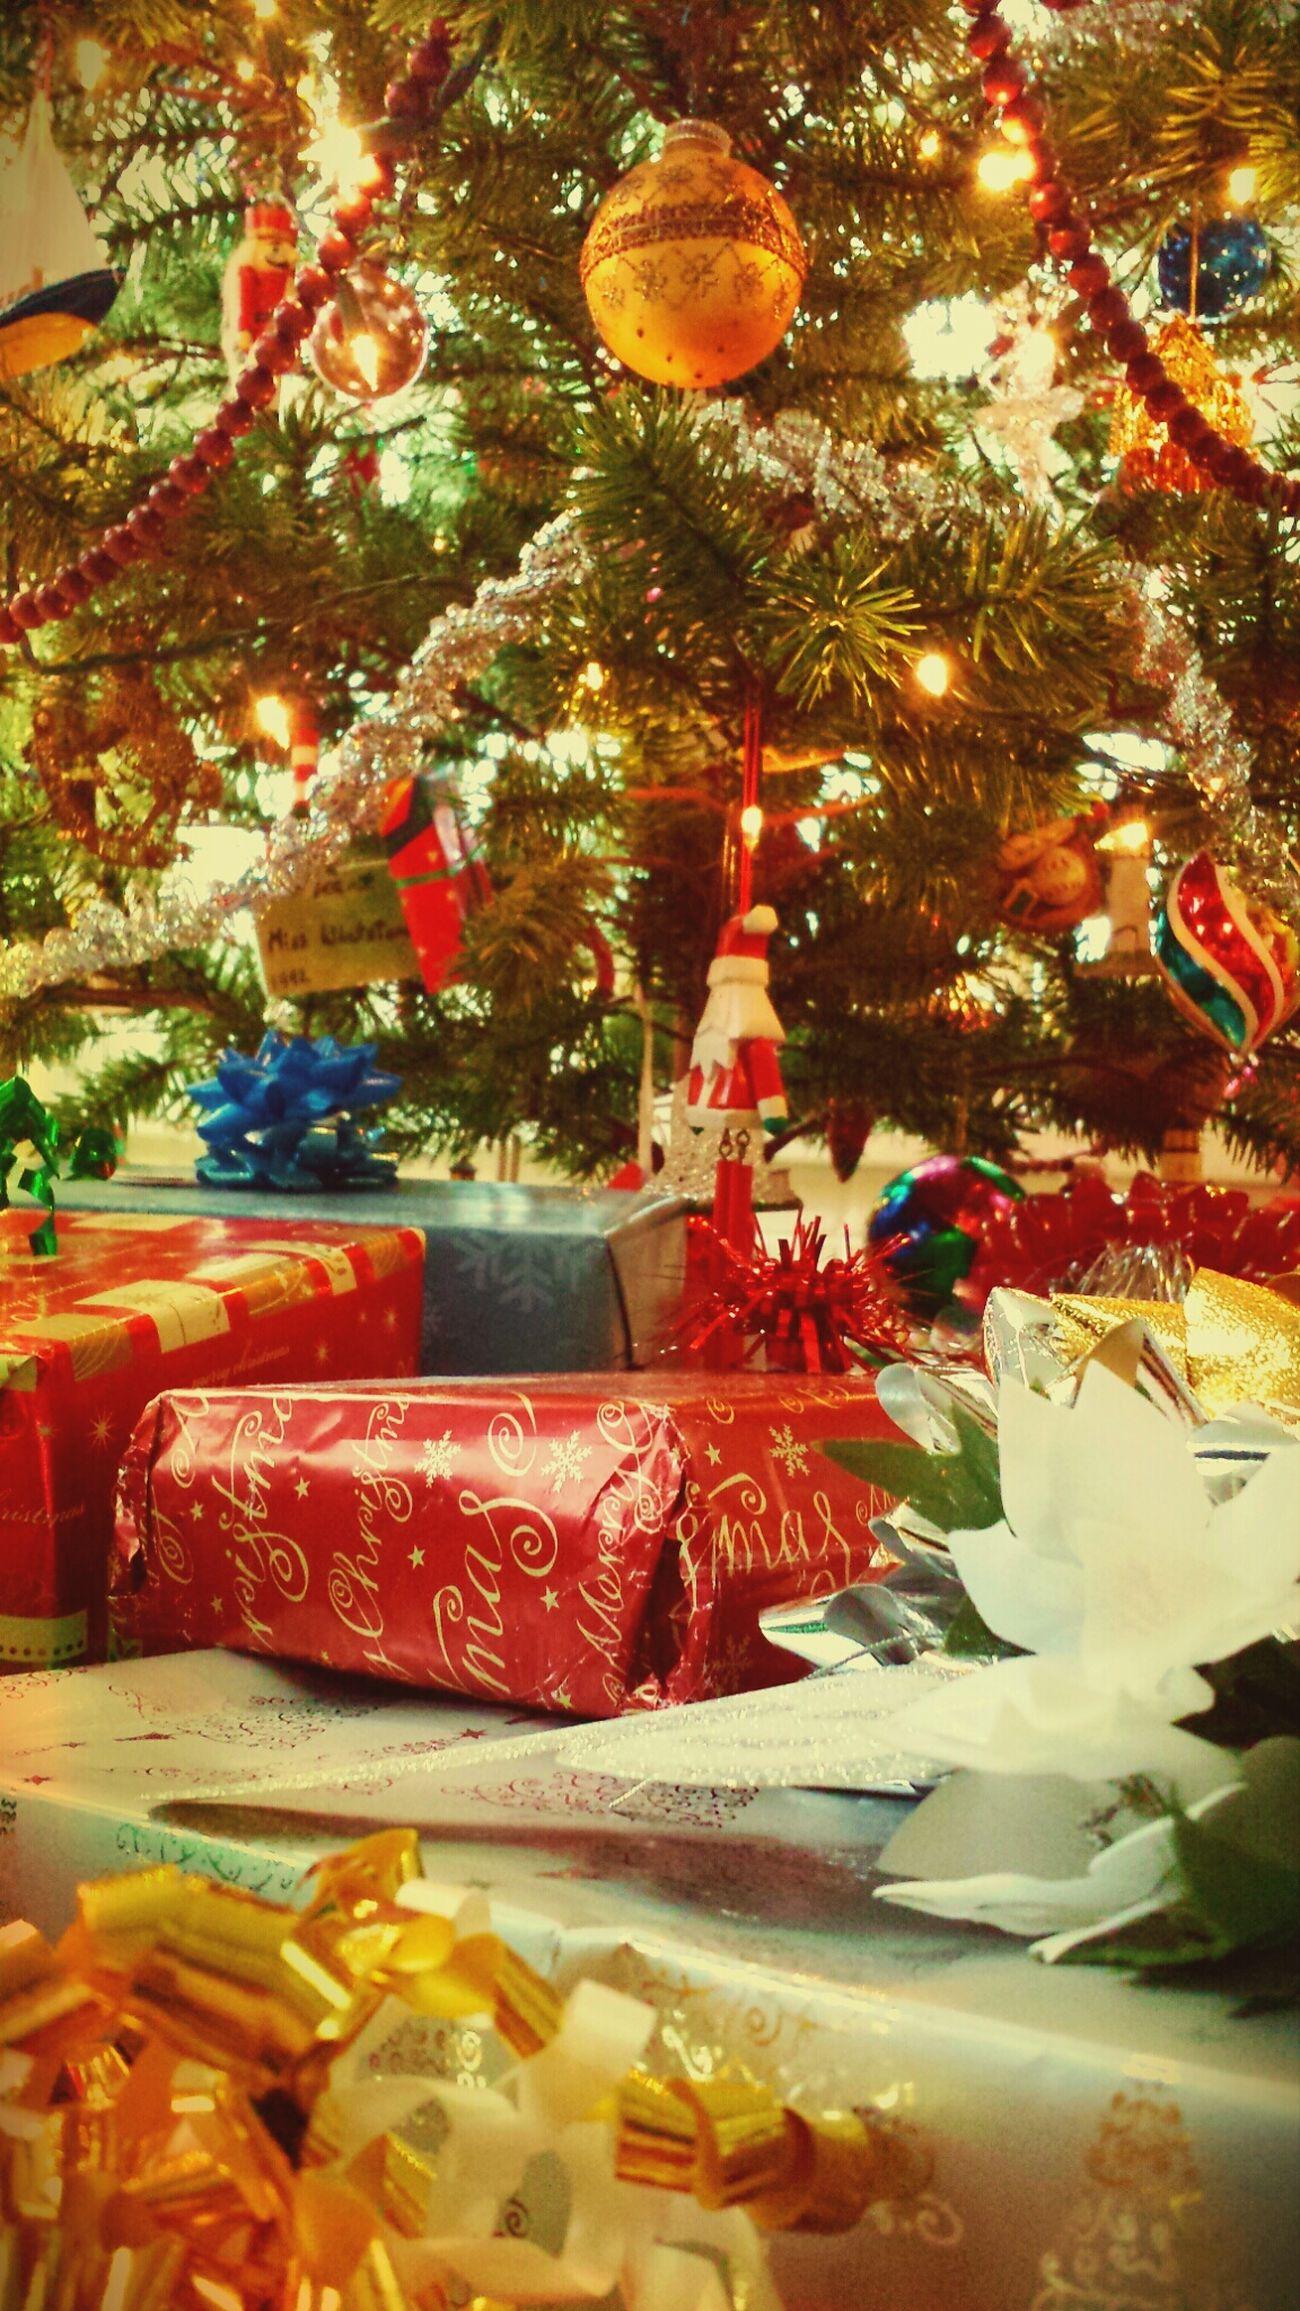 Xmas Tree Happy Christmas Christmas Presents